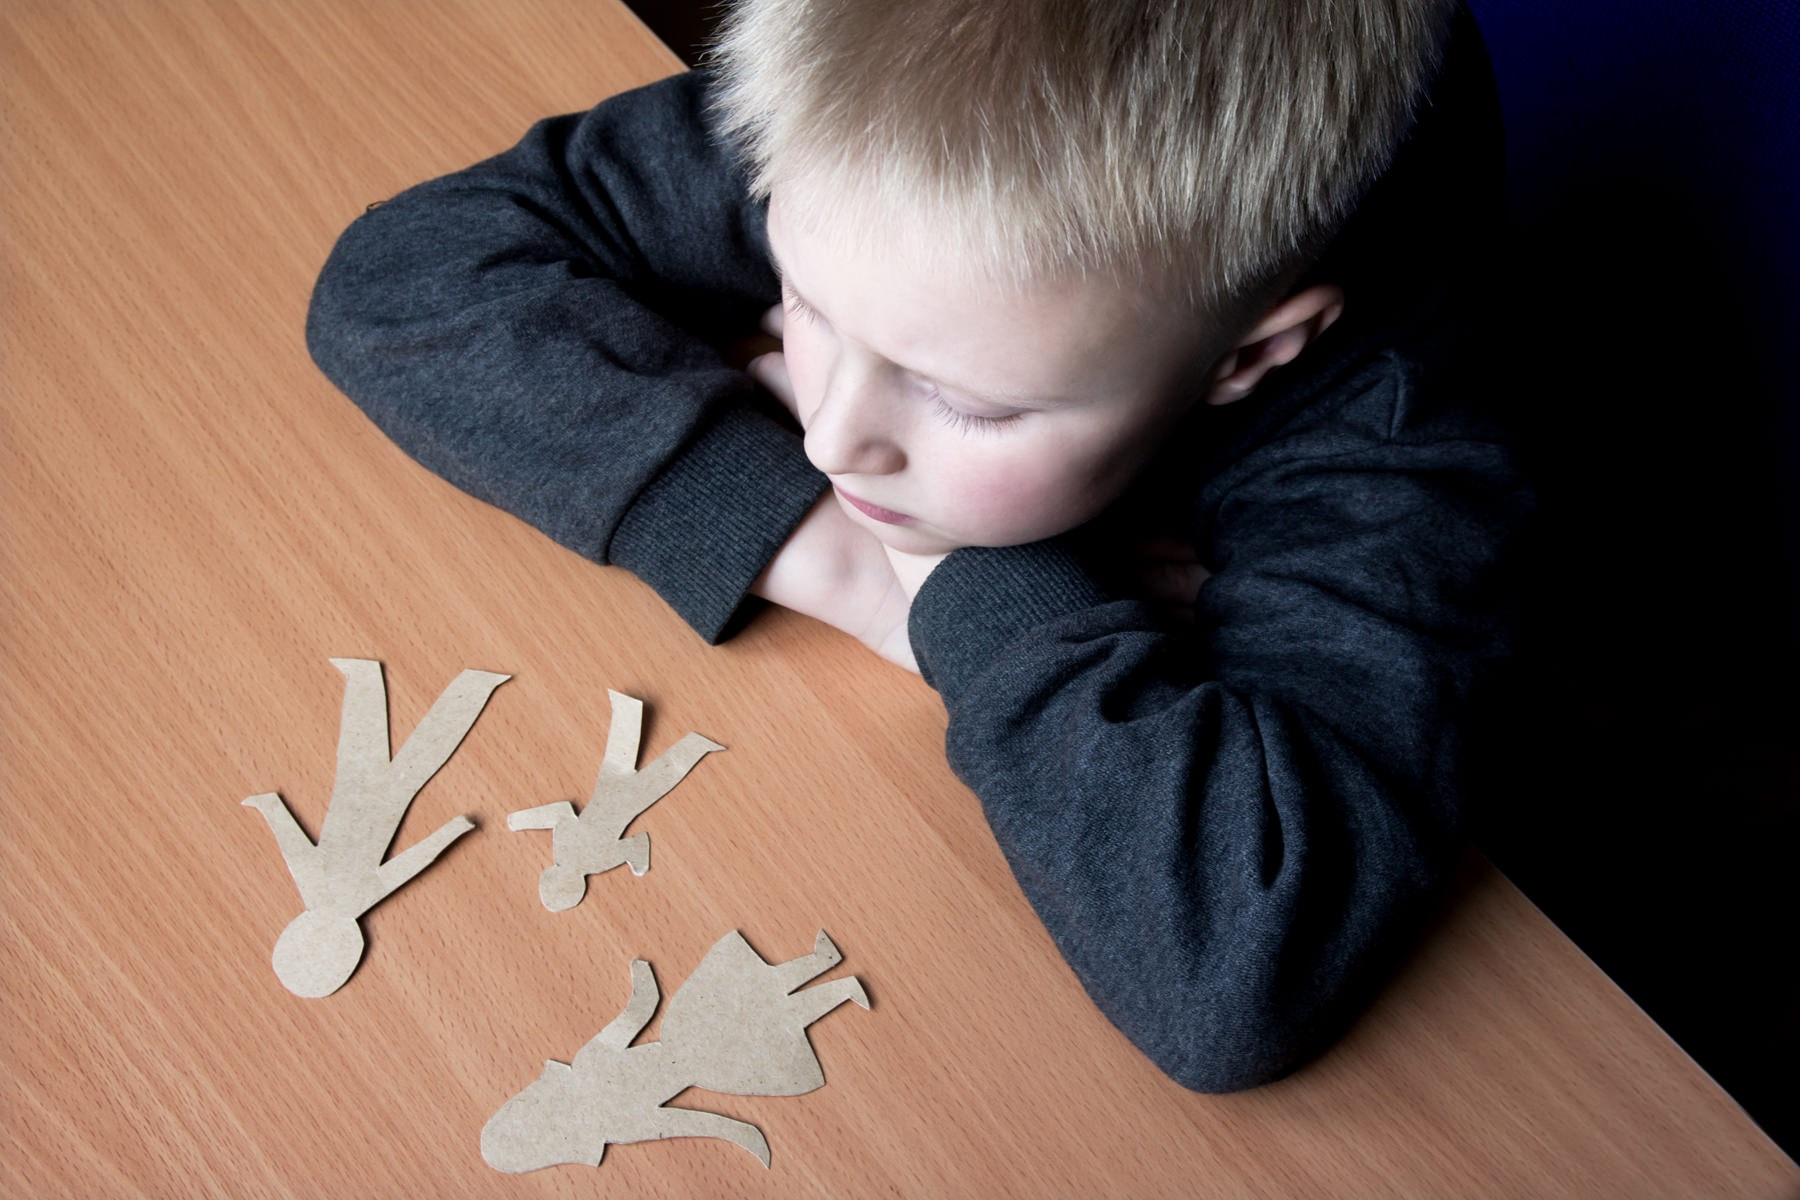 При каких условиях при разводе отец может забрать ребенка у матери